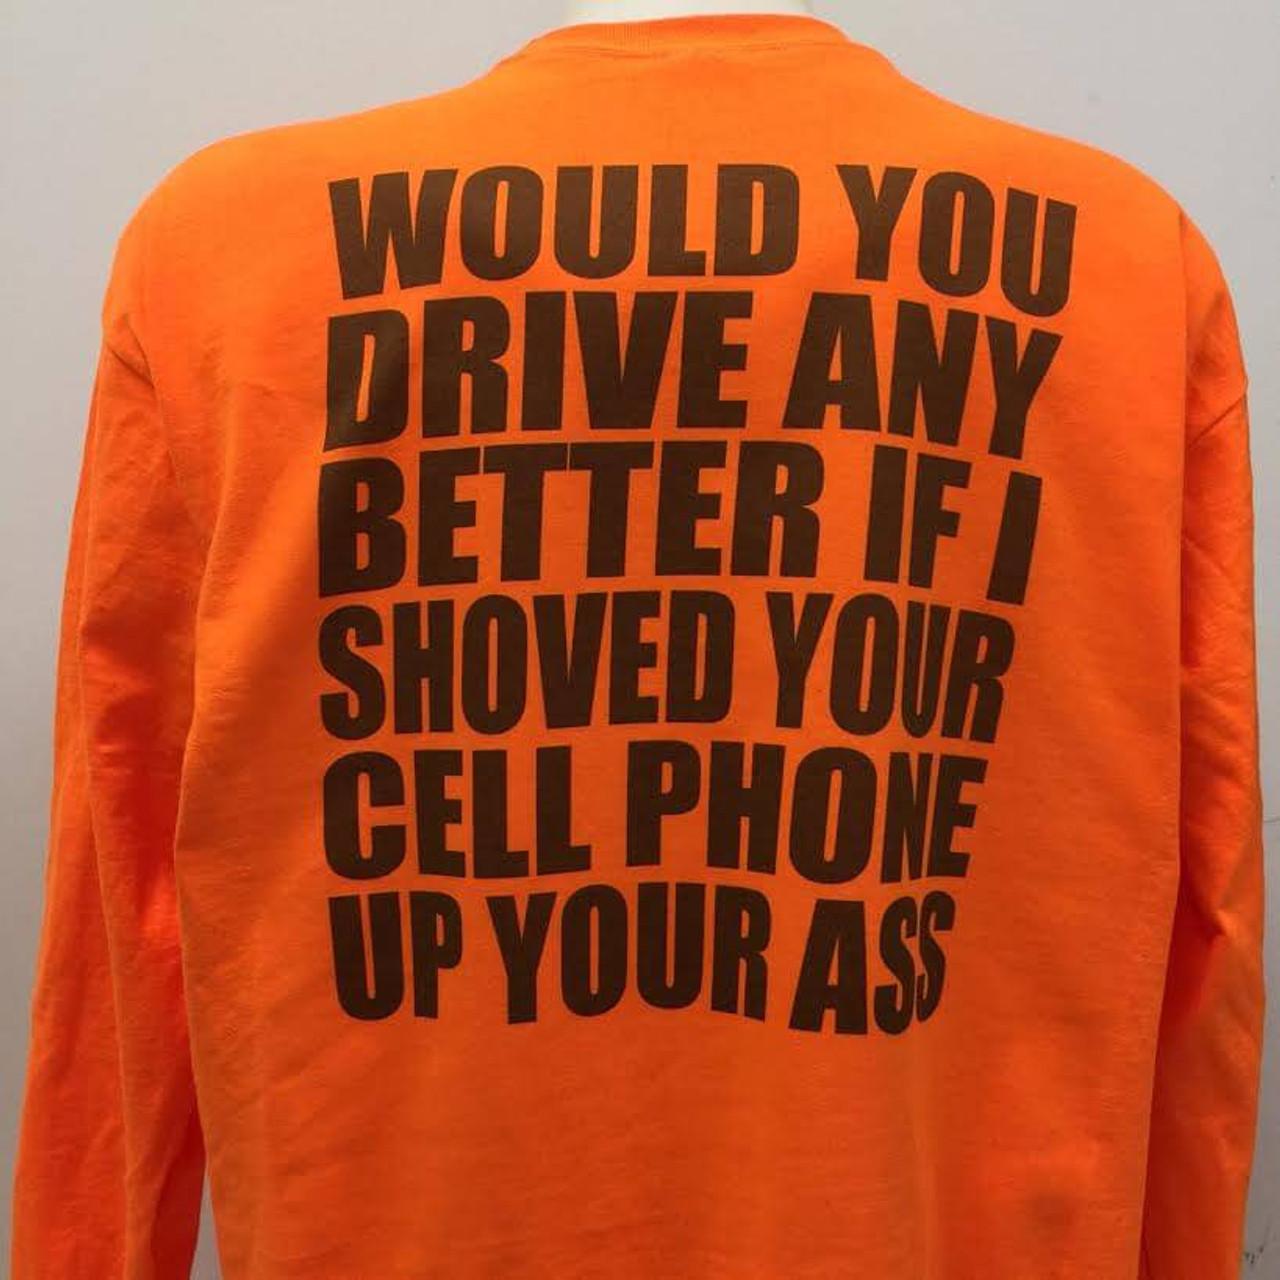 Cell phone ass photos